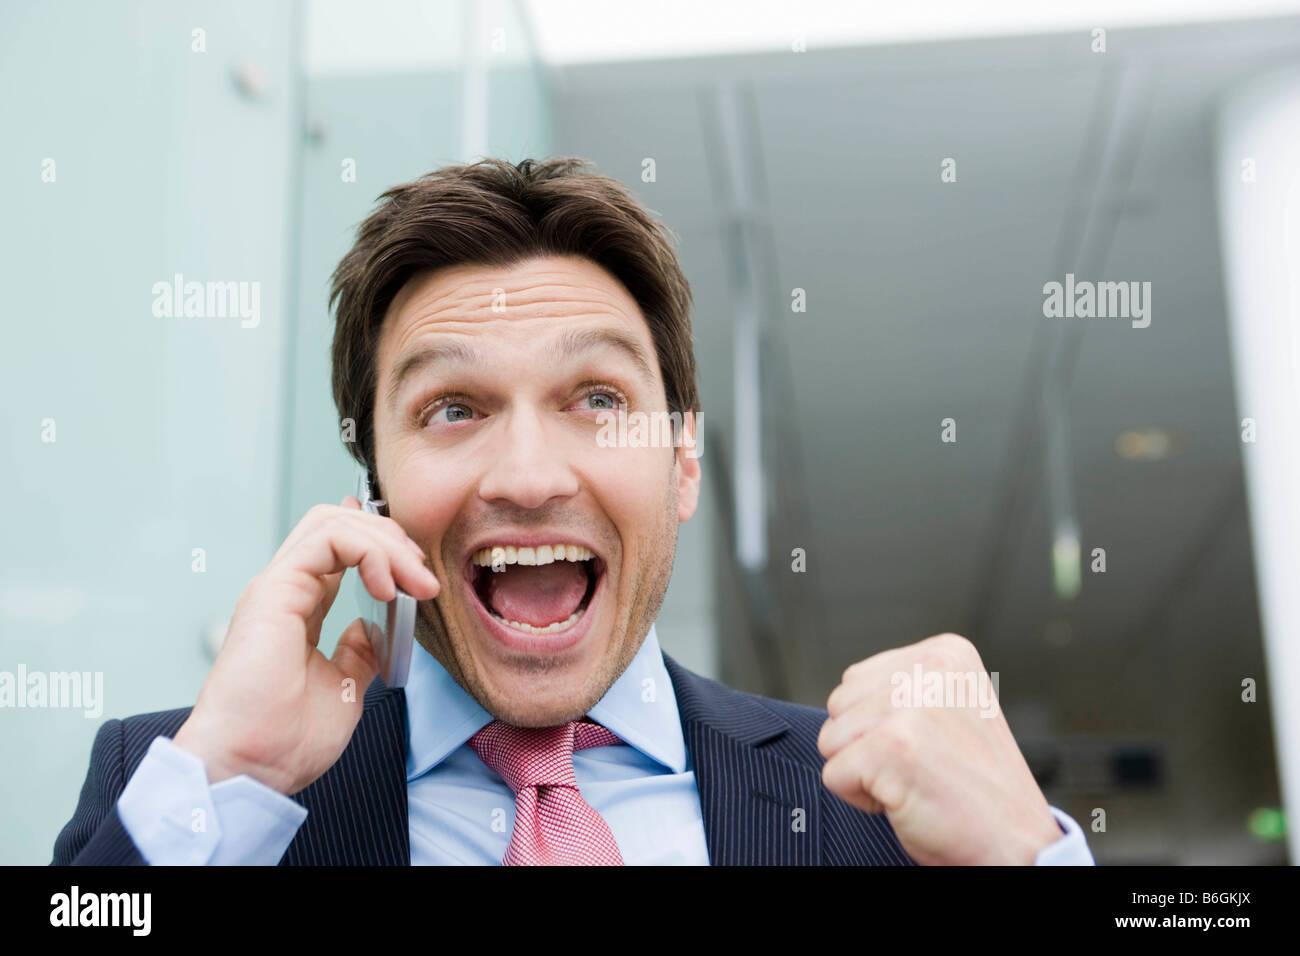 Man bursting of happiness - Stock Image